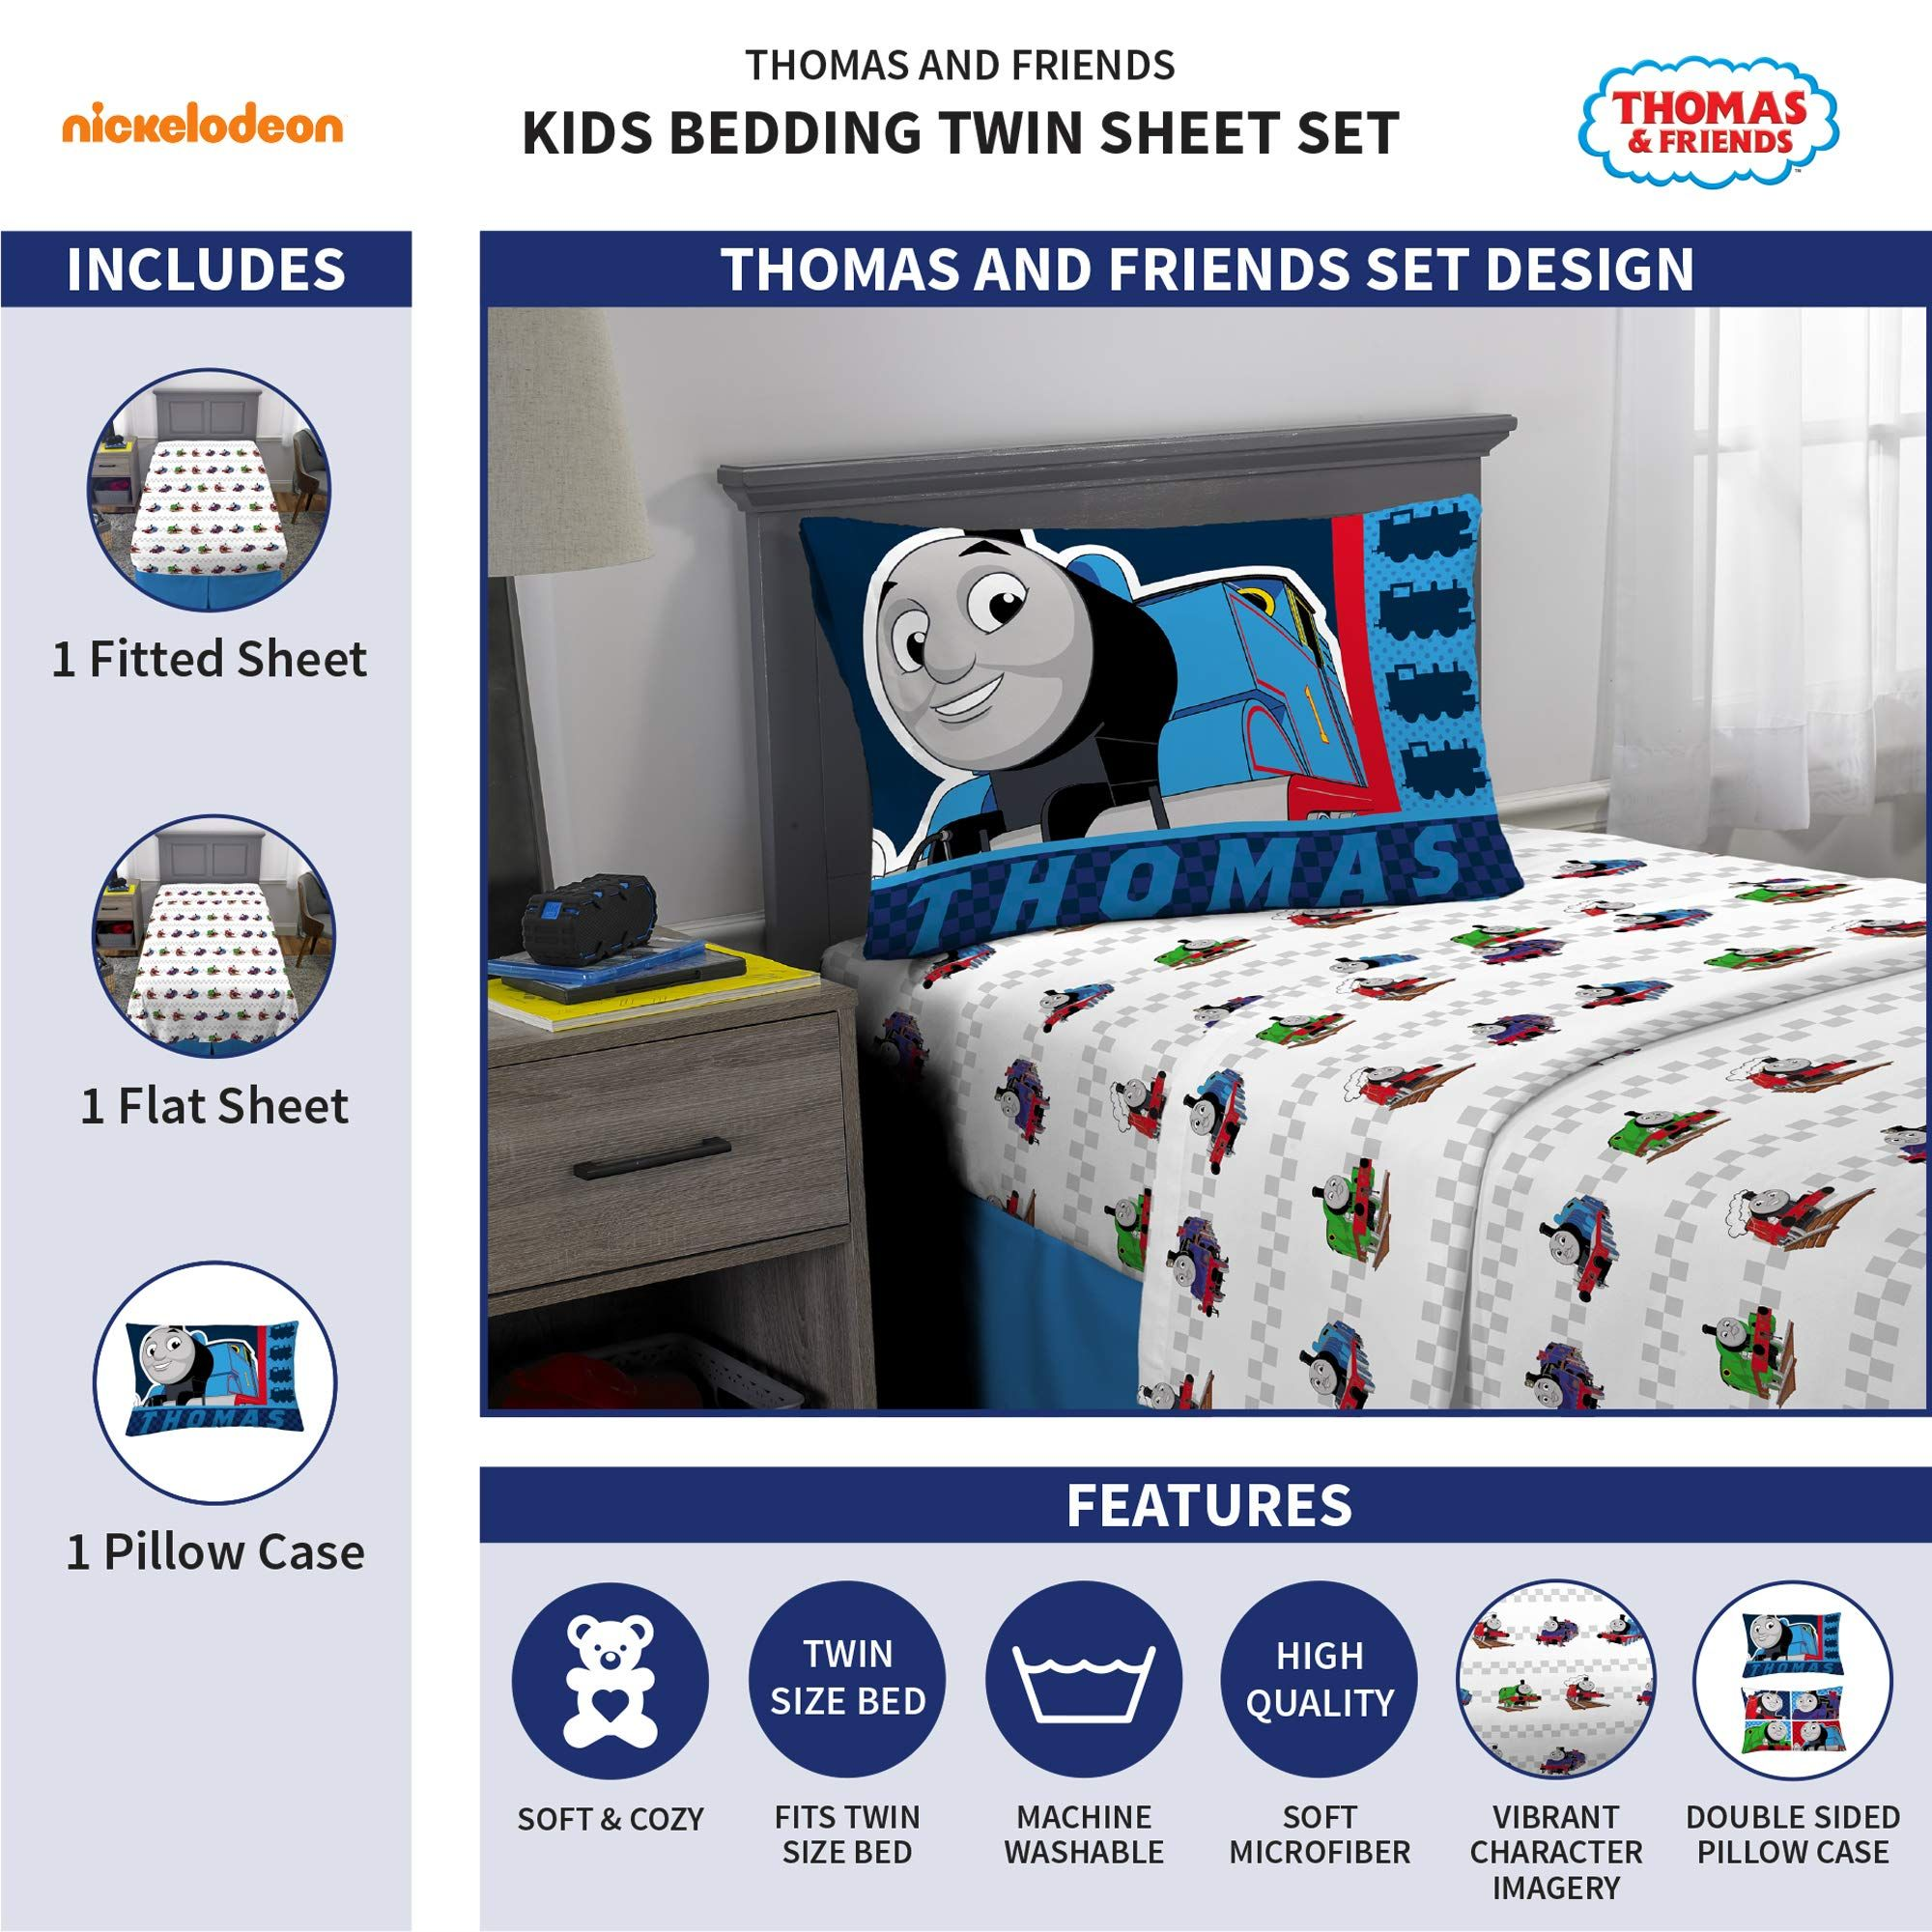 Thomas And Friends Kids Bedding Soft Microfiber Sheet Set 3 Piece